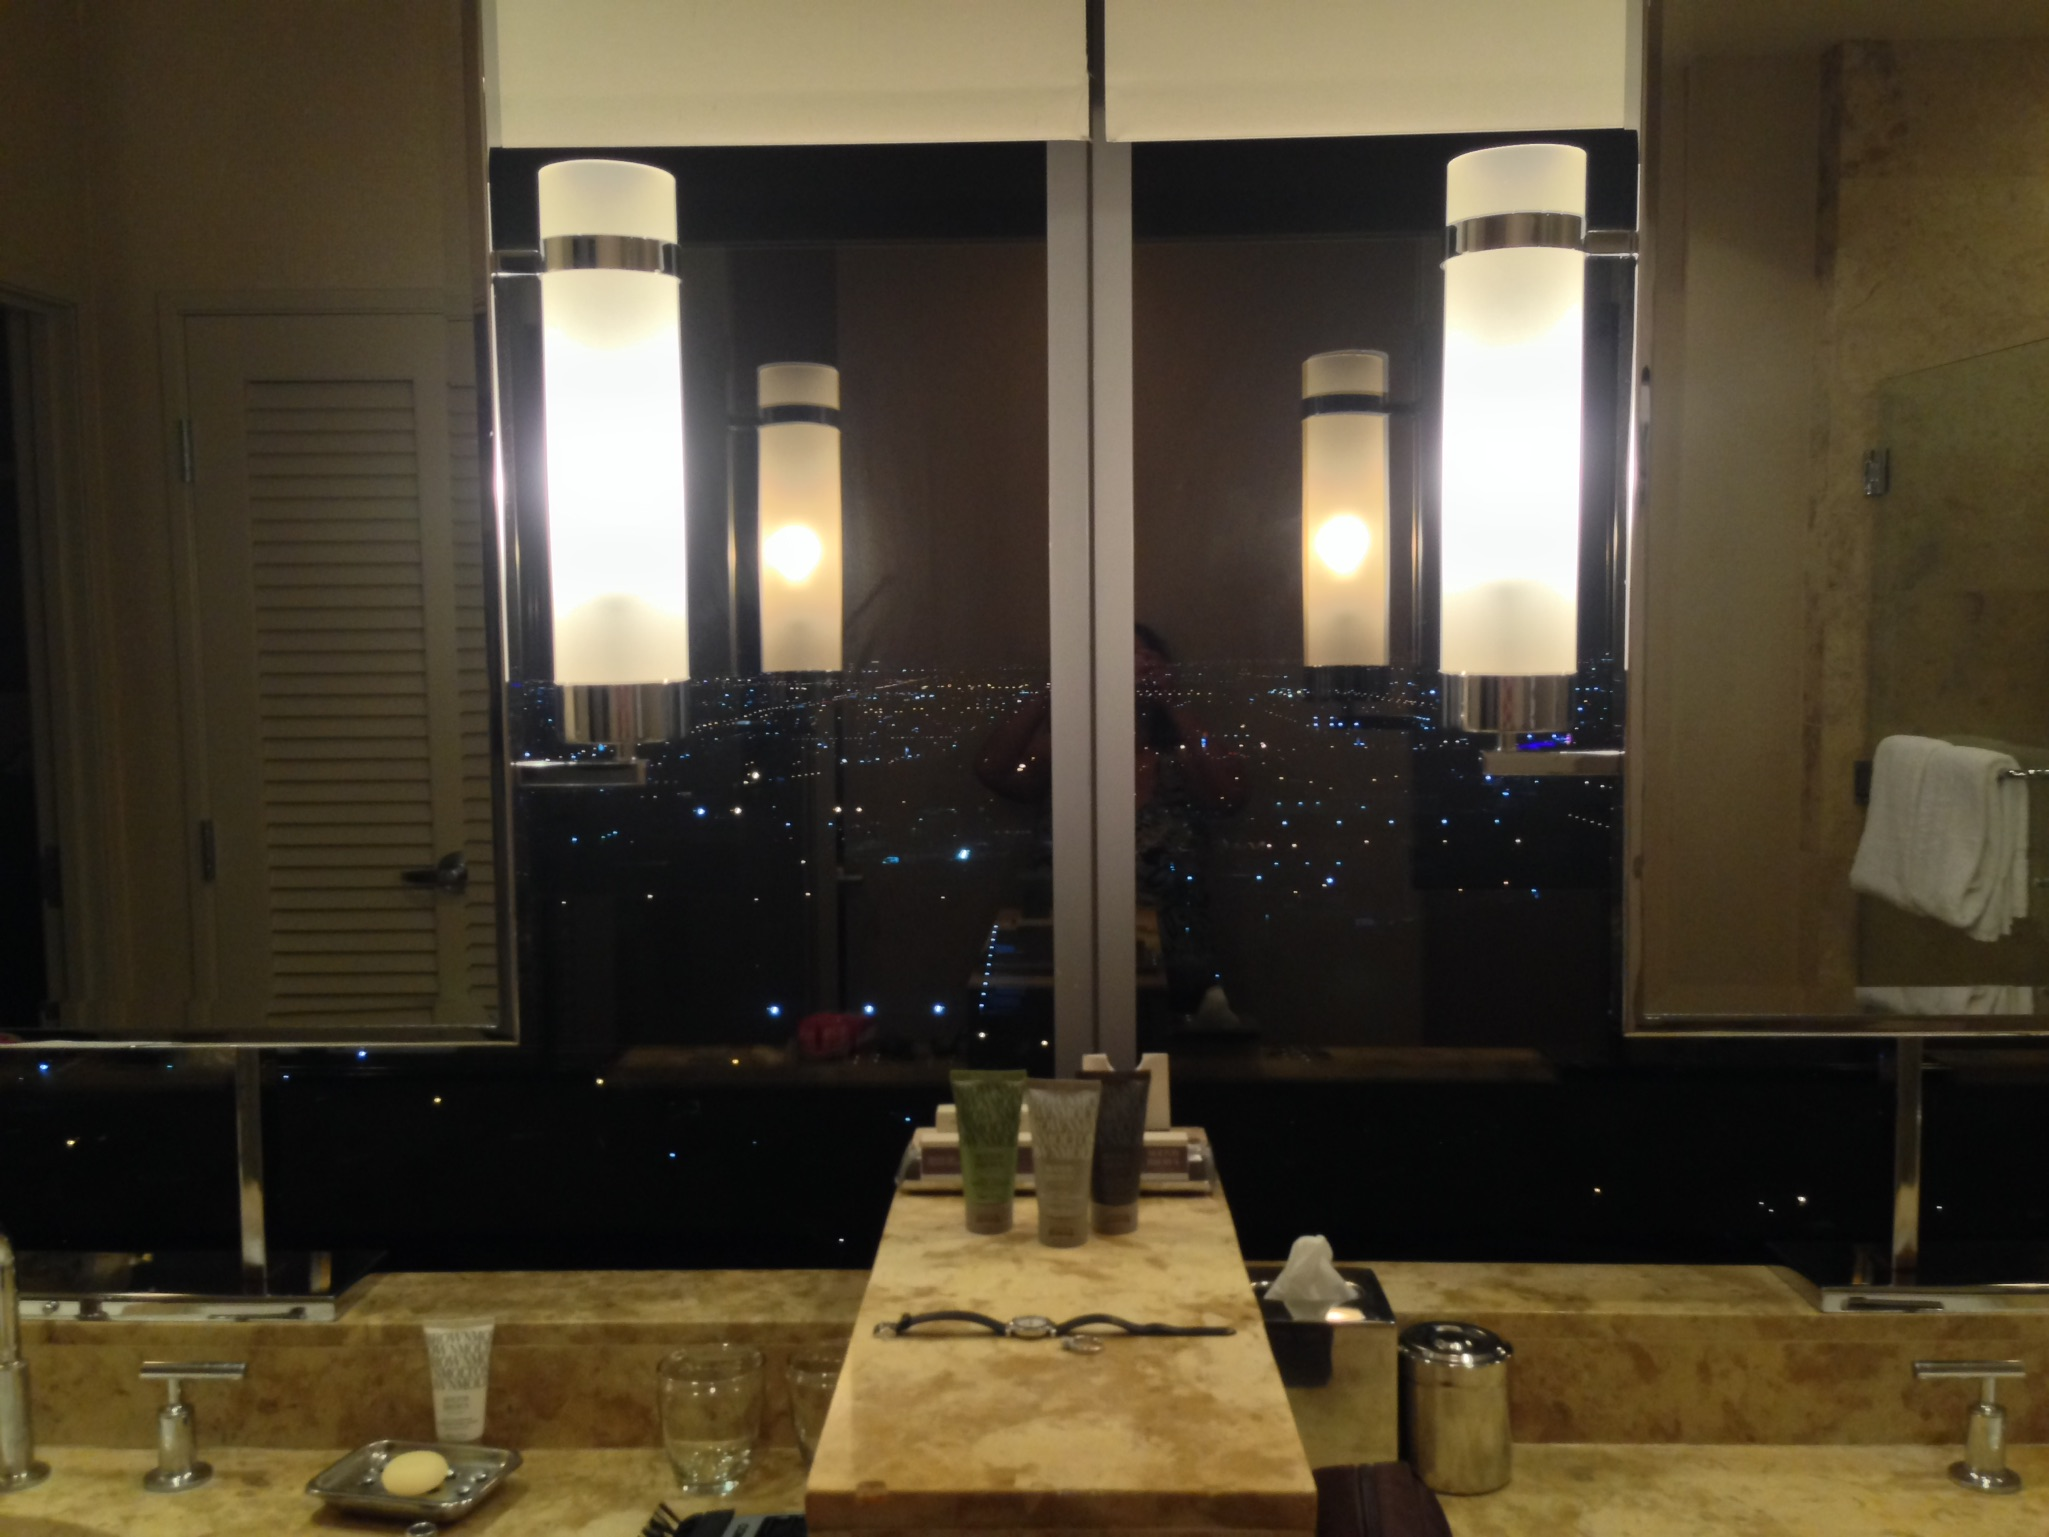 Palms Place 2 Bedroom Suite Palms Las Vegas Hotel Room Upgrades Discounts